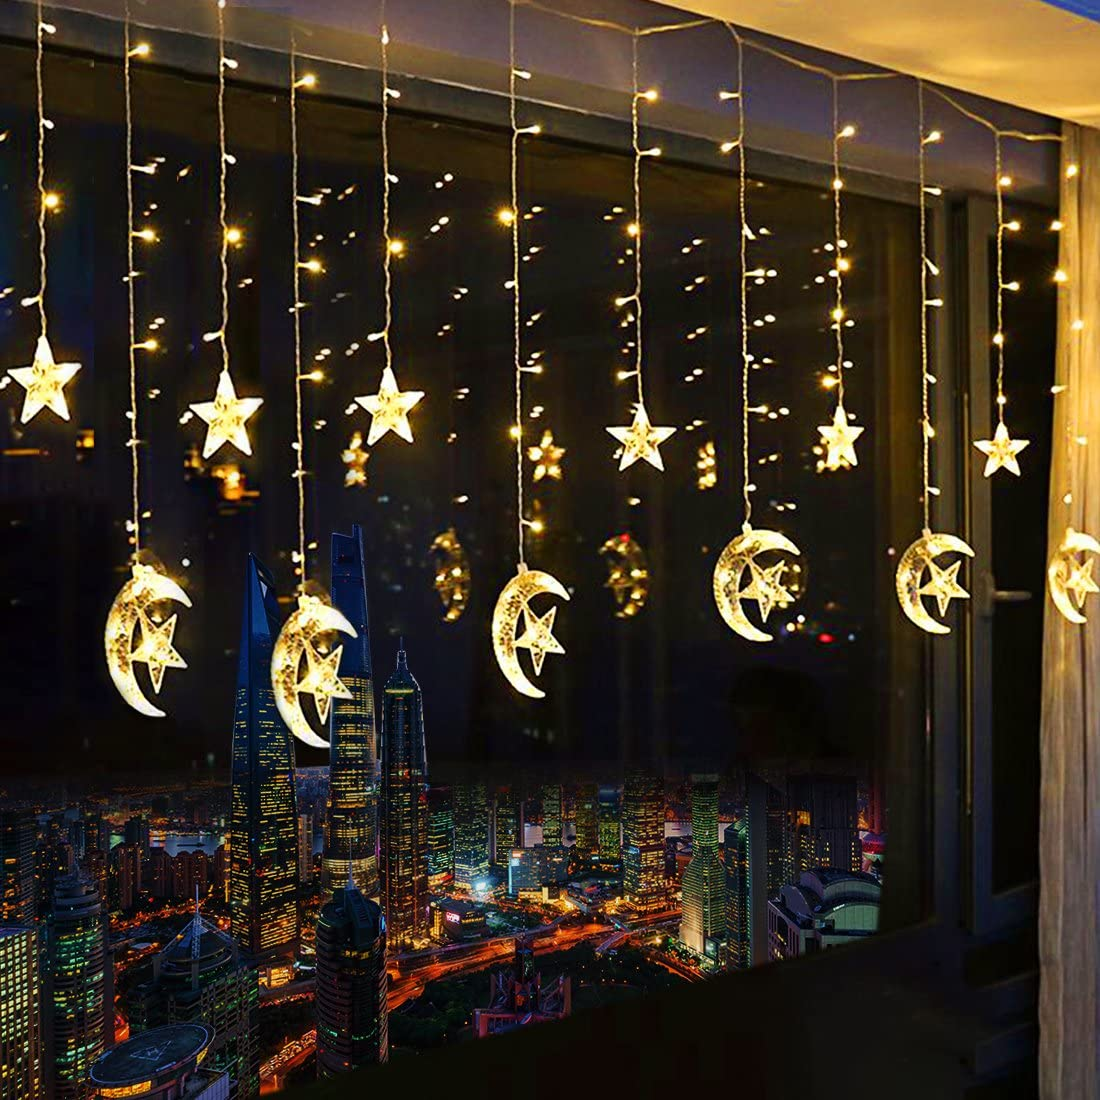 Tencoz 11 LED Star Curtain Lights, Window Curtain String Light Moon Star  Fairy String Lights for Wedding Party Home Garden Bedroom Outdoor Indoor